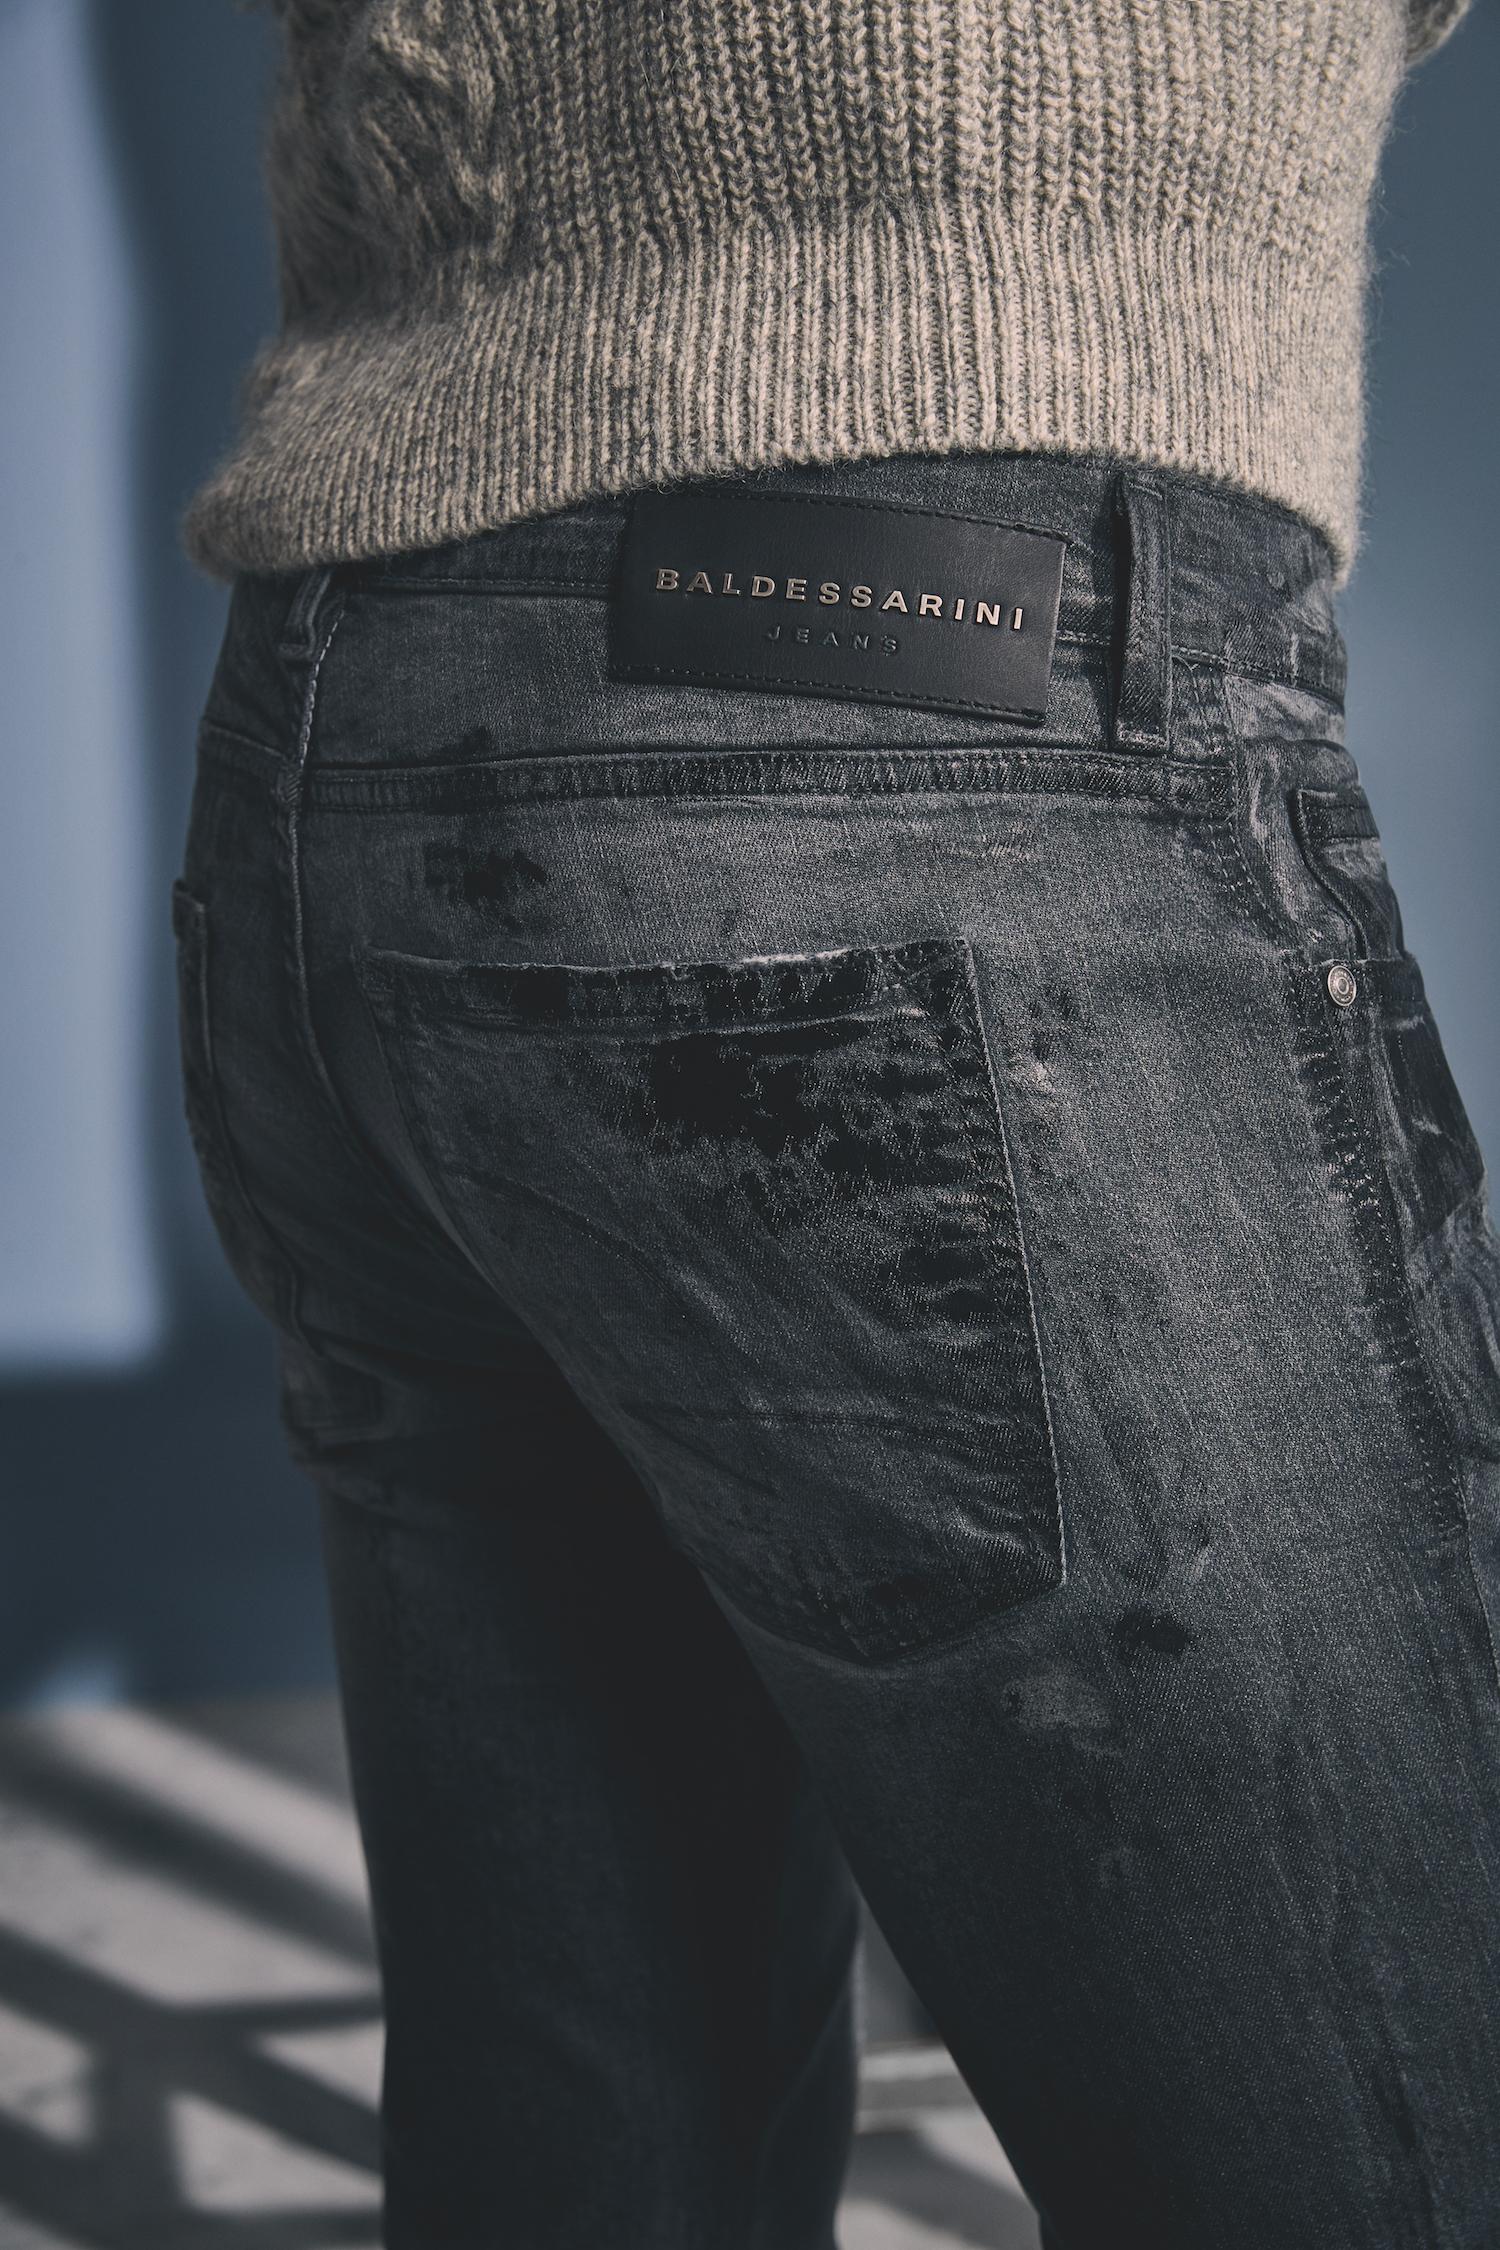 Baldessarini_3-jeans.jpg